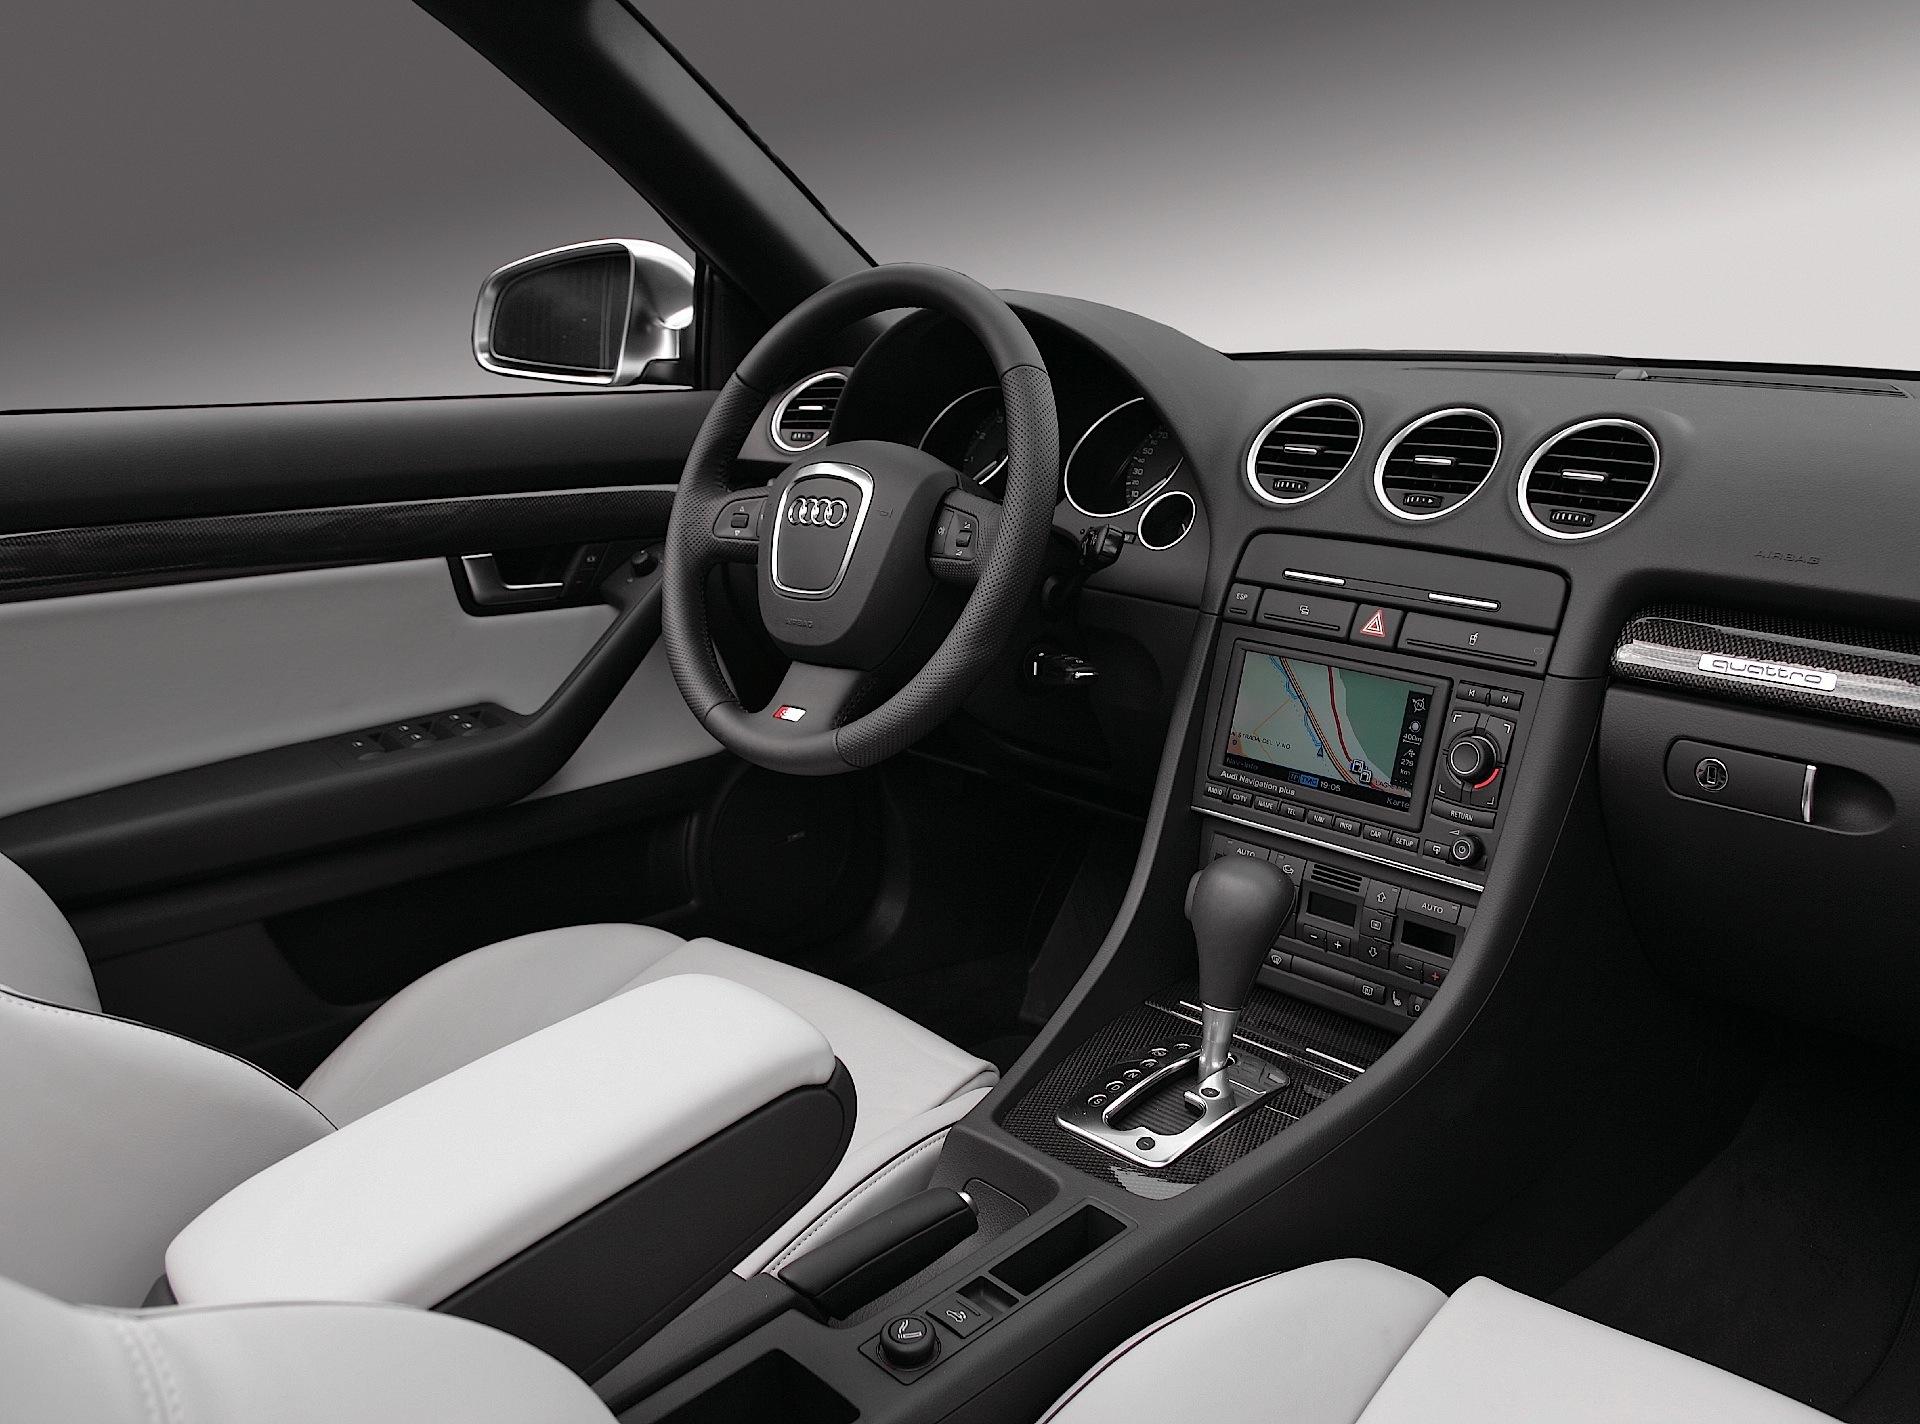 Audi S4 III (B7) 2005 - 2008 Cabriolet #3